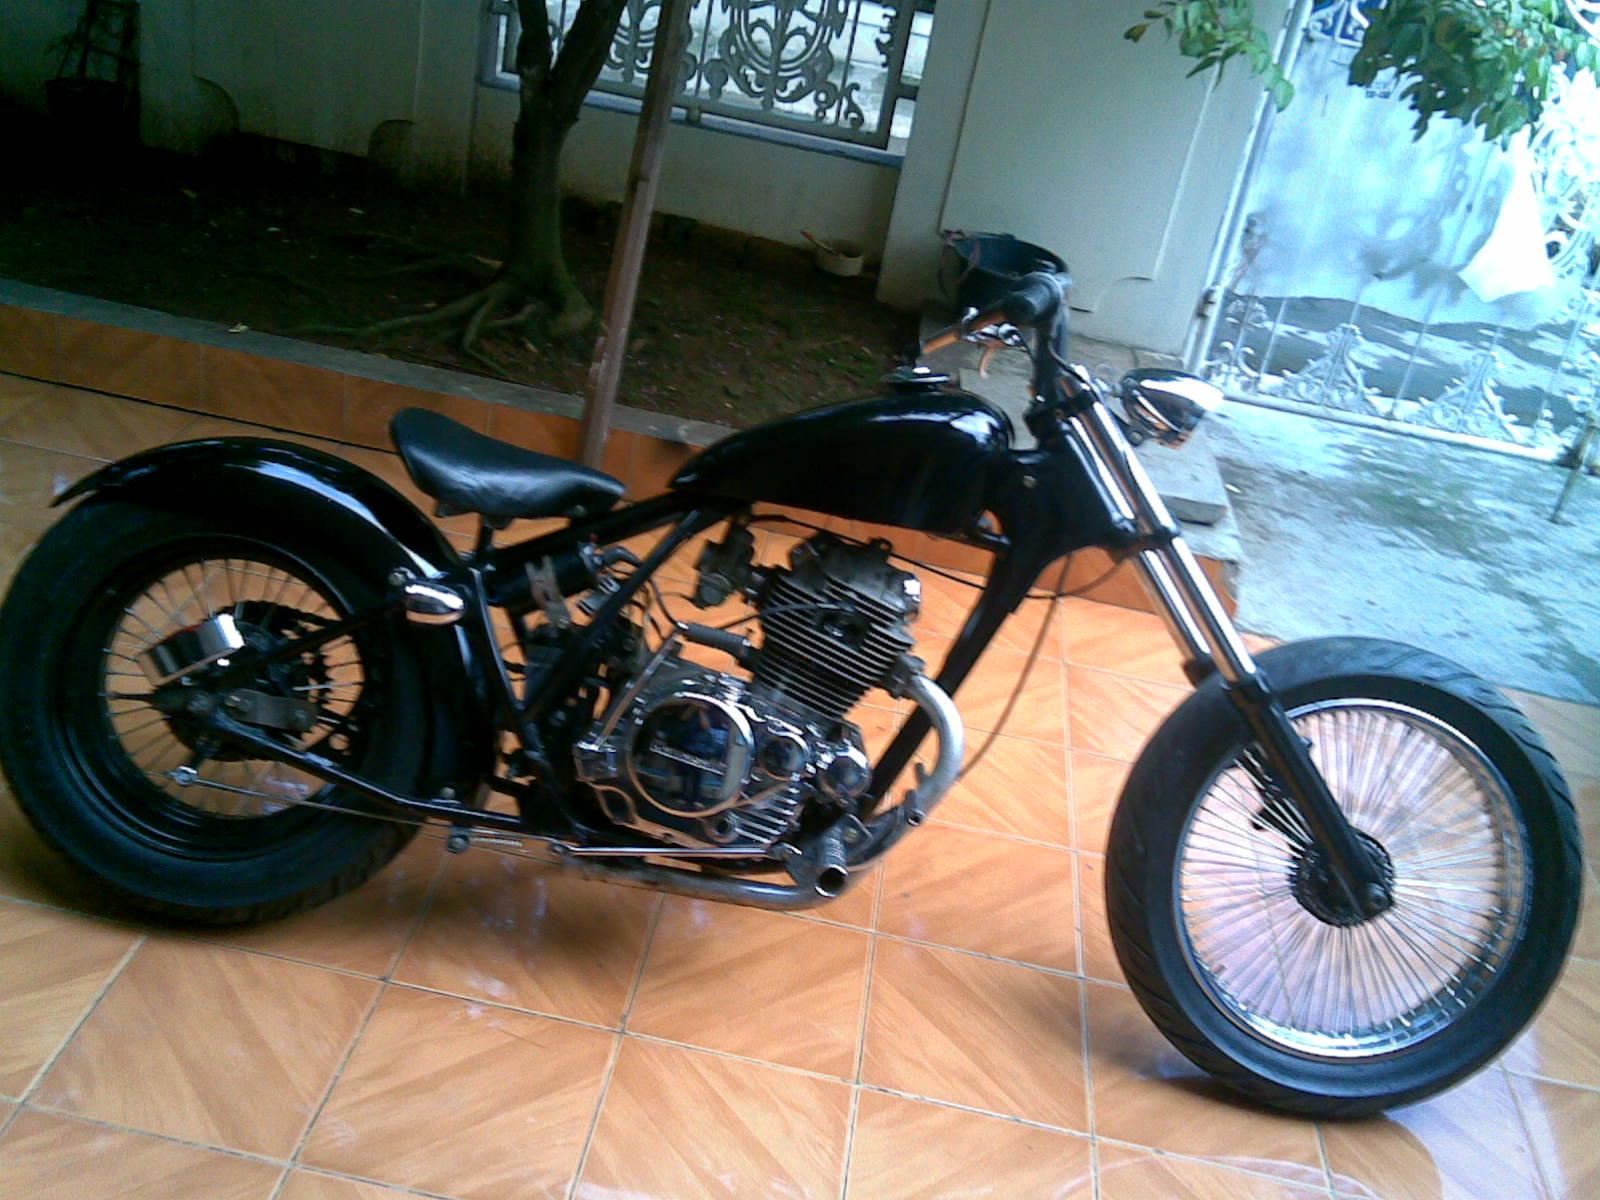 108 Modifikasi Motor Cb Chopper Modifikasi Motor Honda CB Terbaru